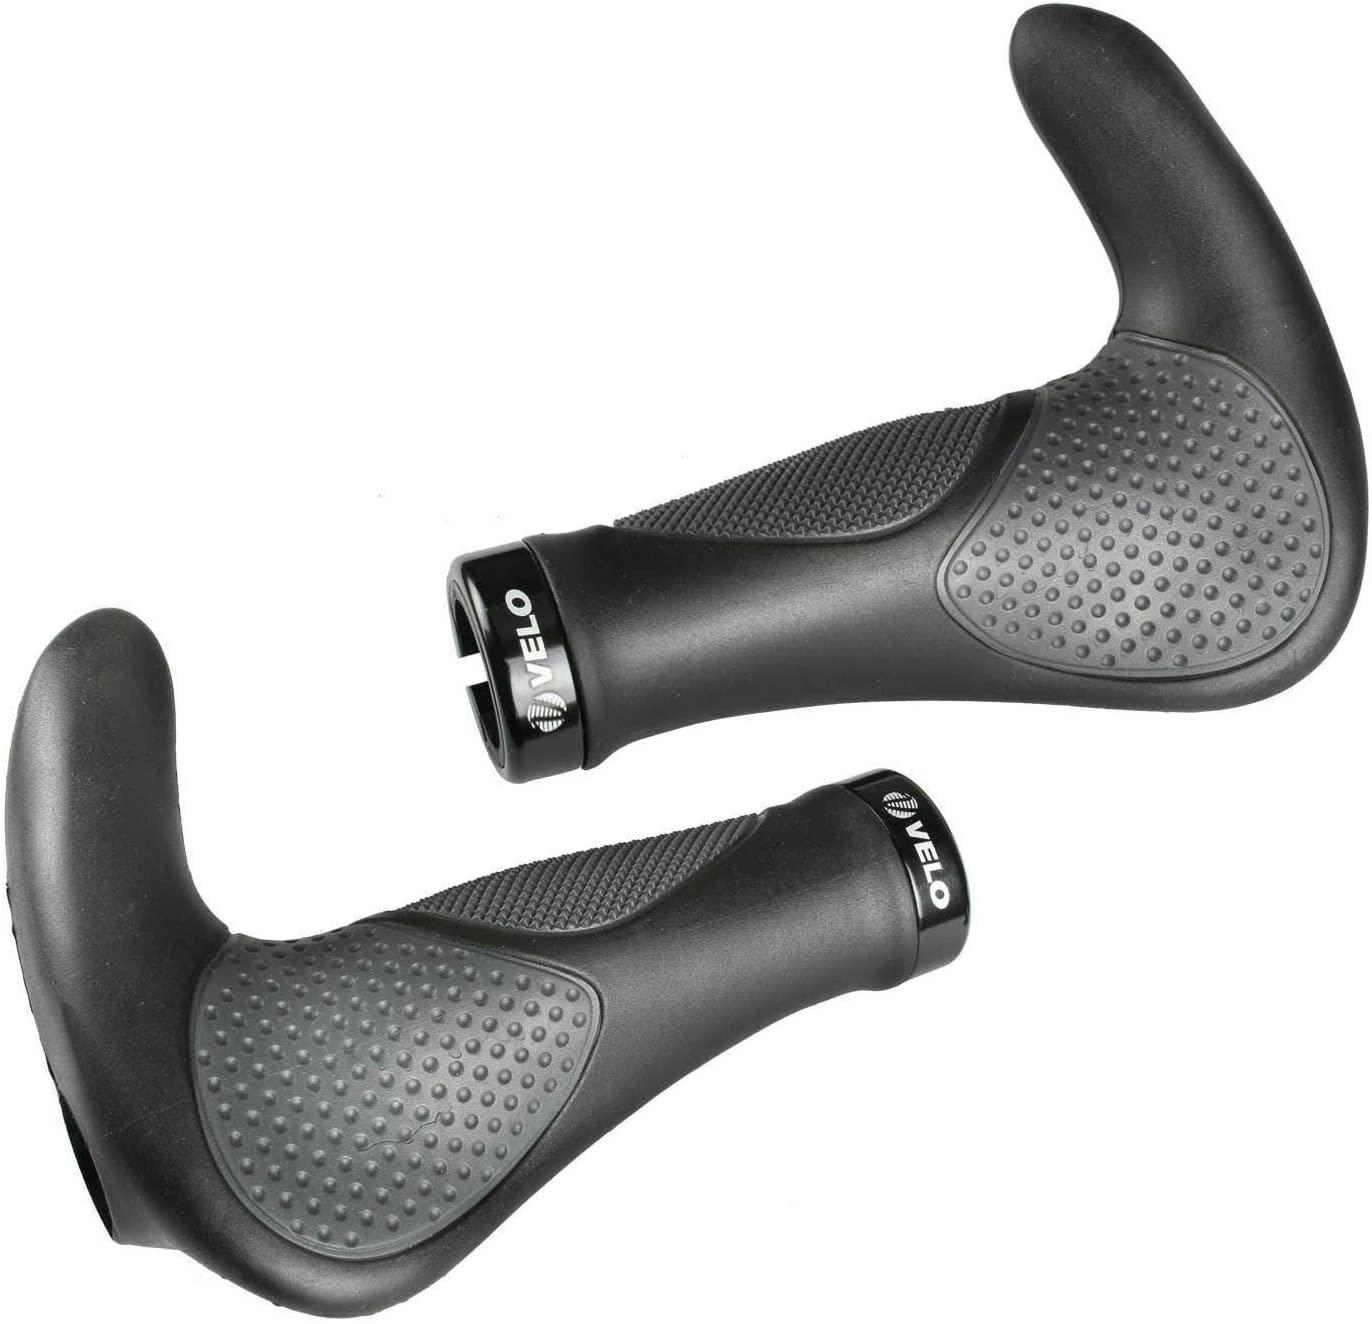 VELO MTB Bike Bicycle Ergonomic Design Grips Handlebar Soft Anti Slip